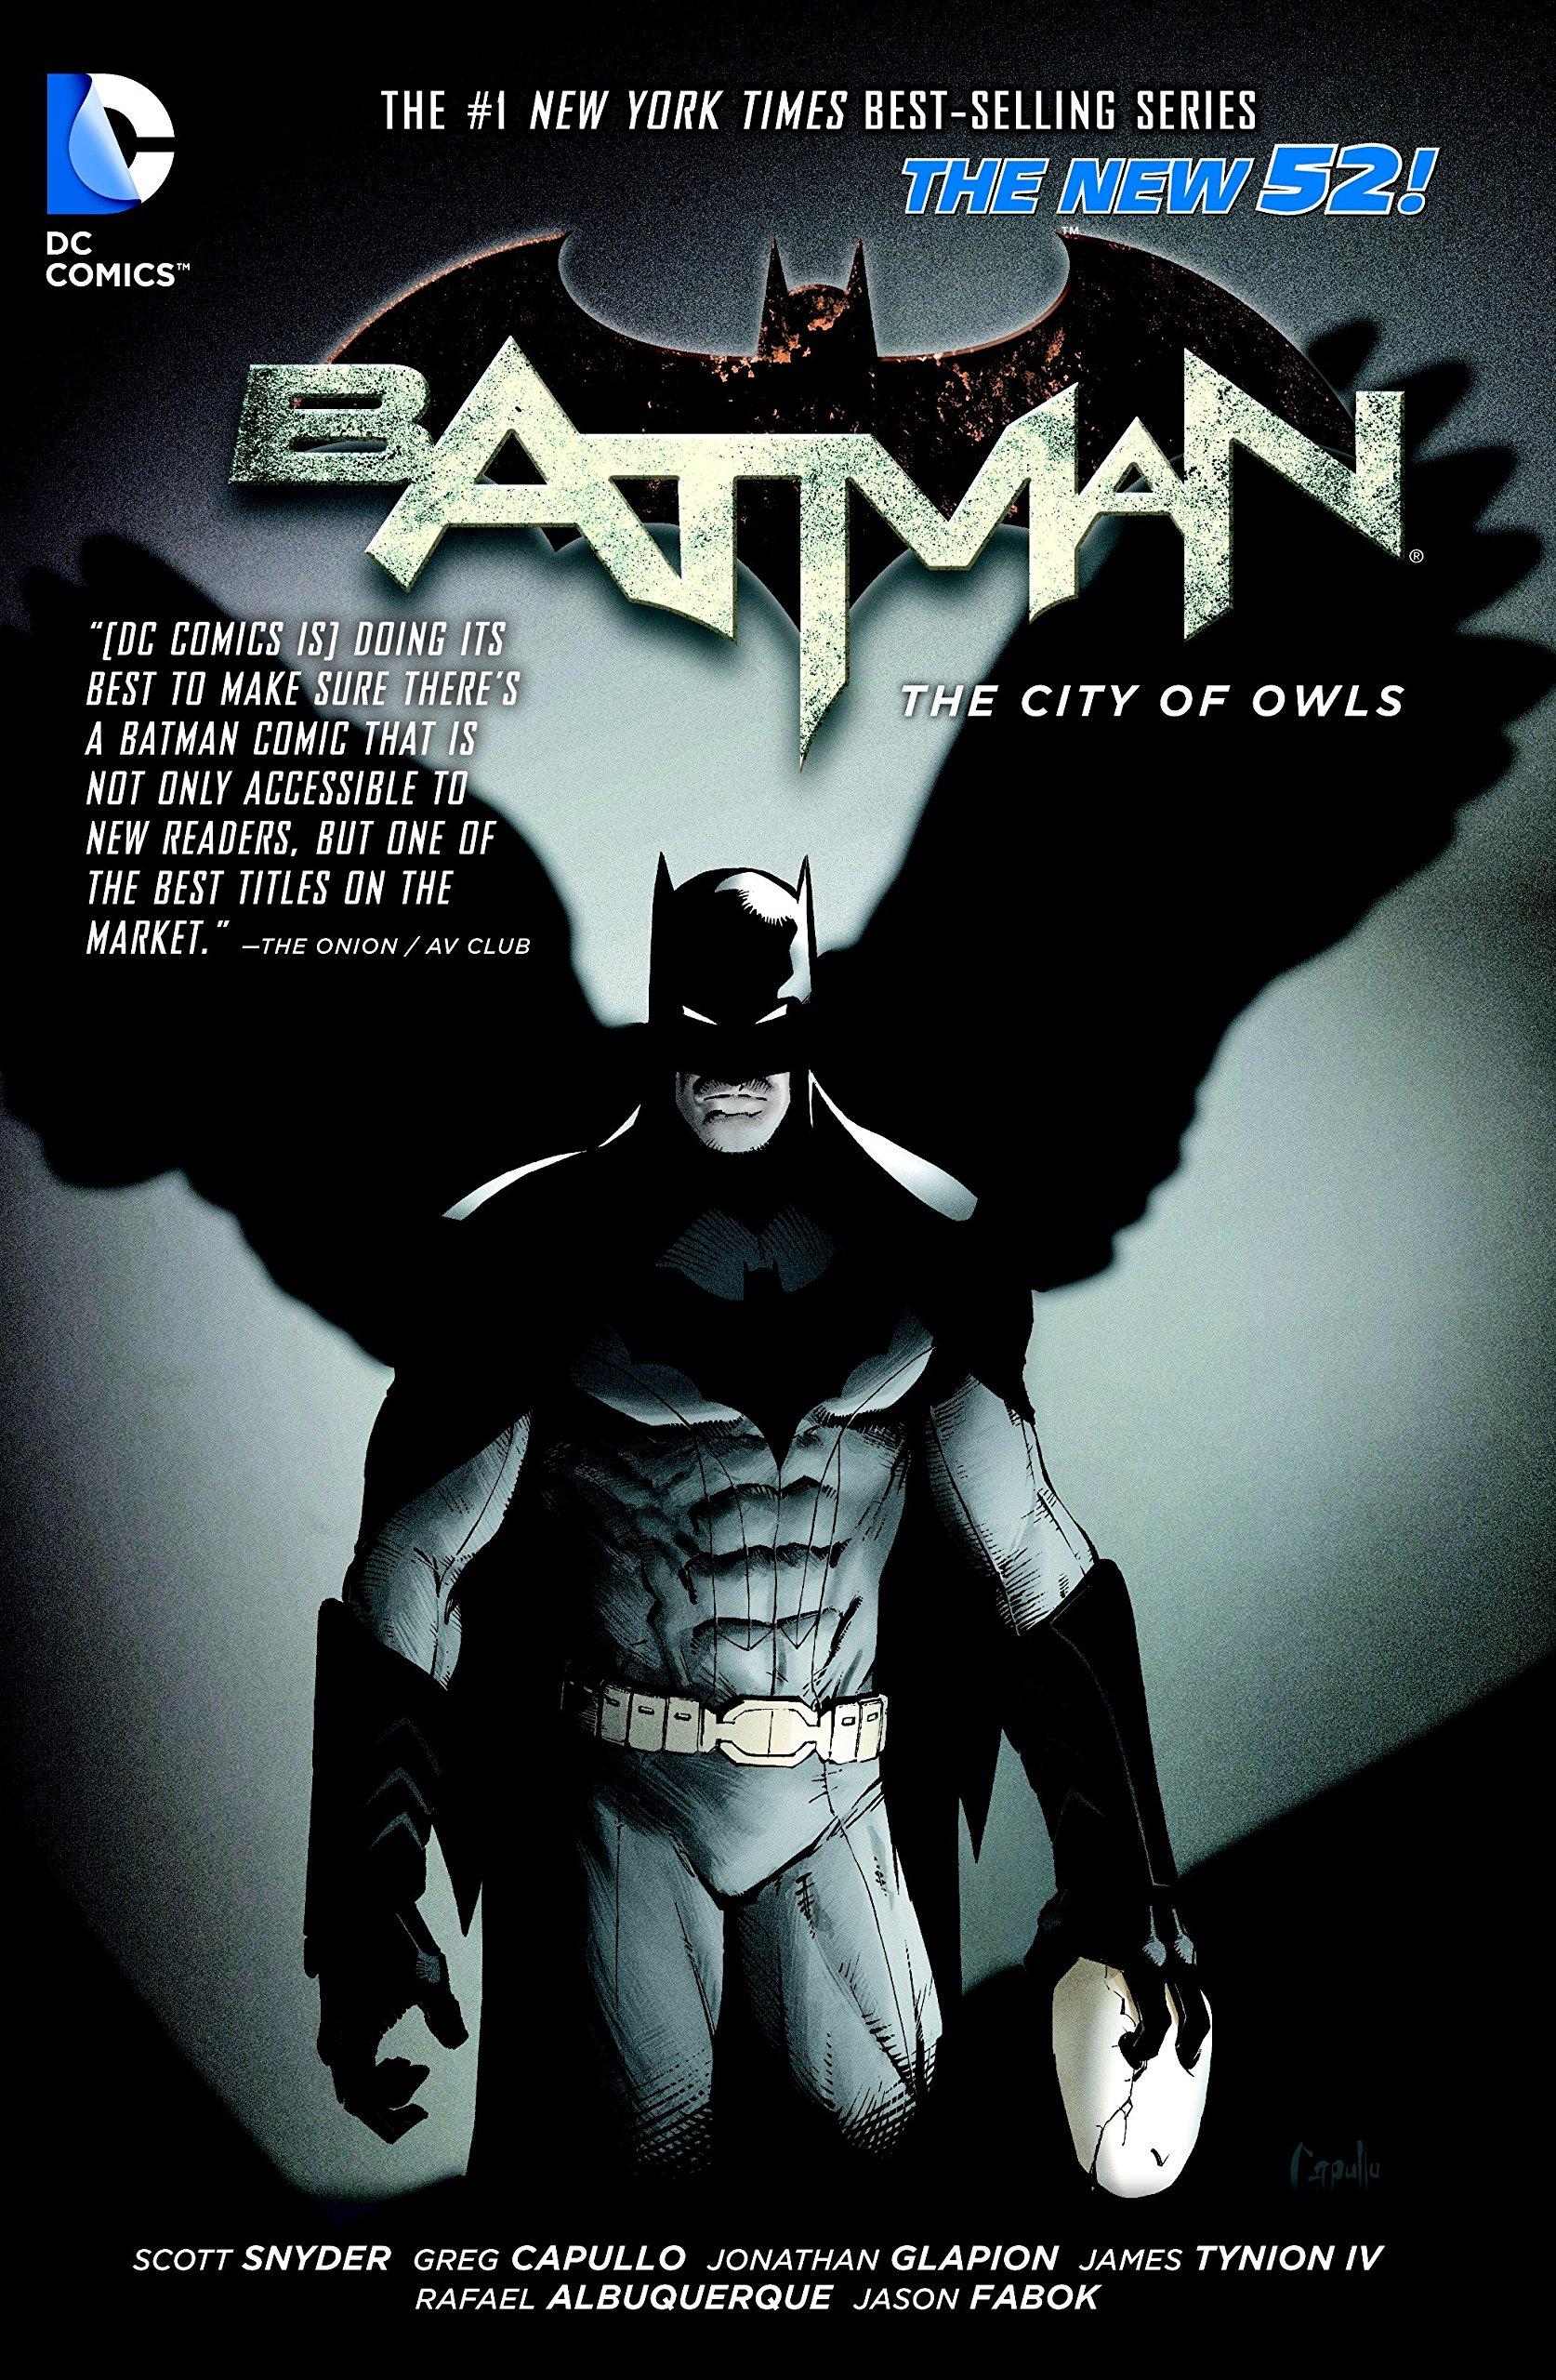 Amazon.com: Batman Vol. 2: The City of Owls (The New 52) (9789351116615):  Scott Snyder, Greg Capullo, Rafael Albuquerque: Books